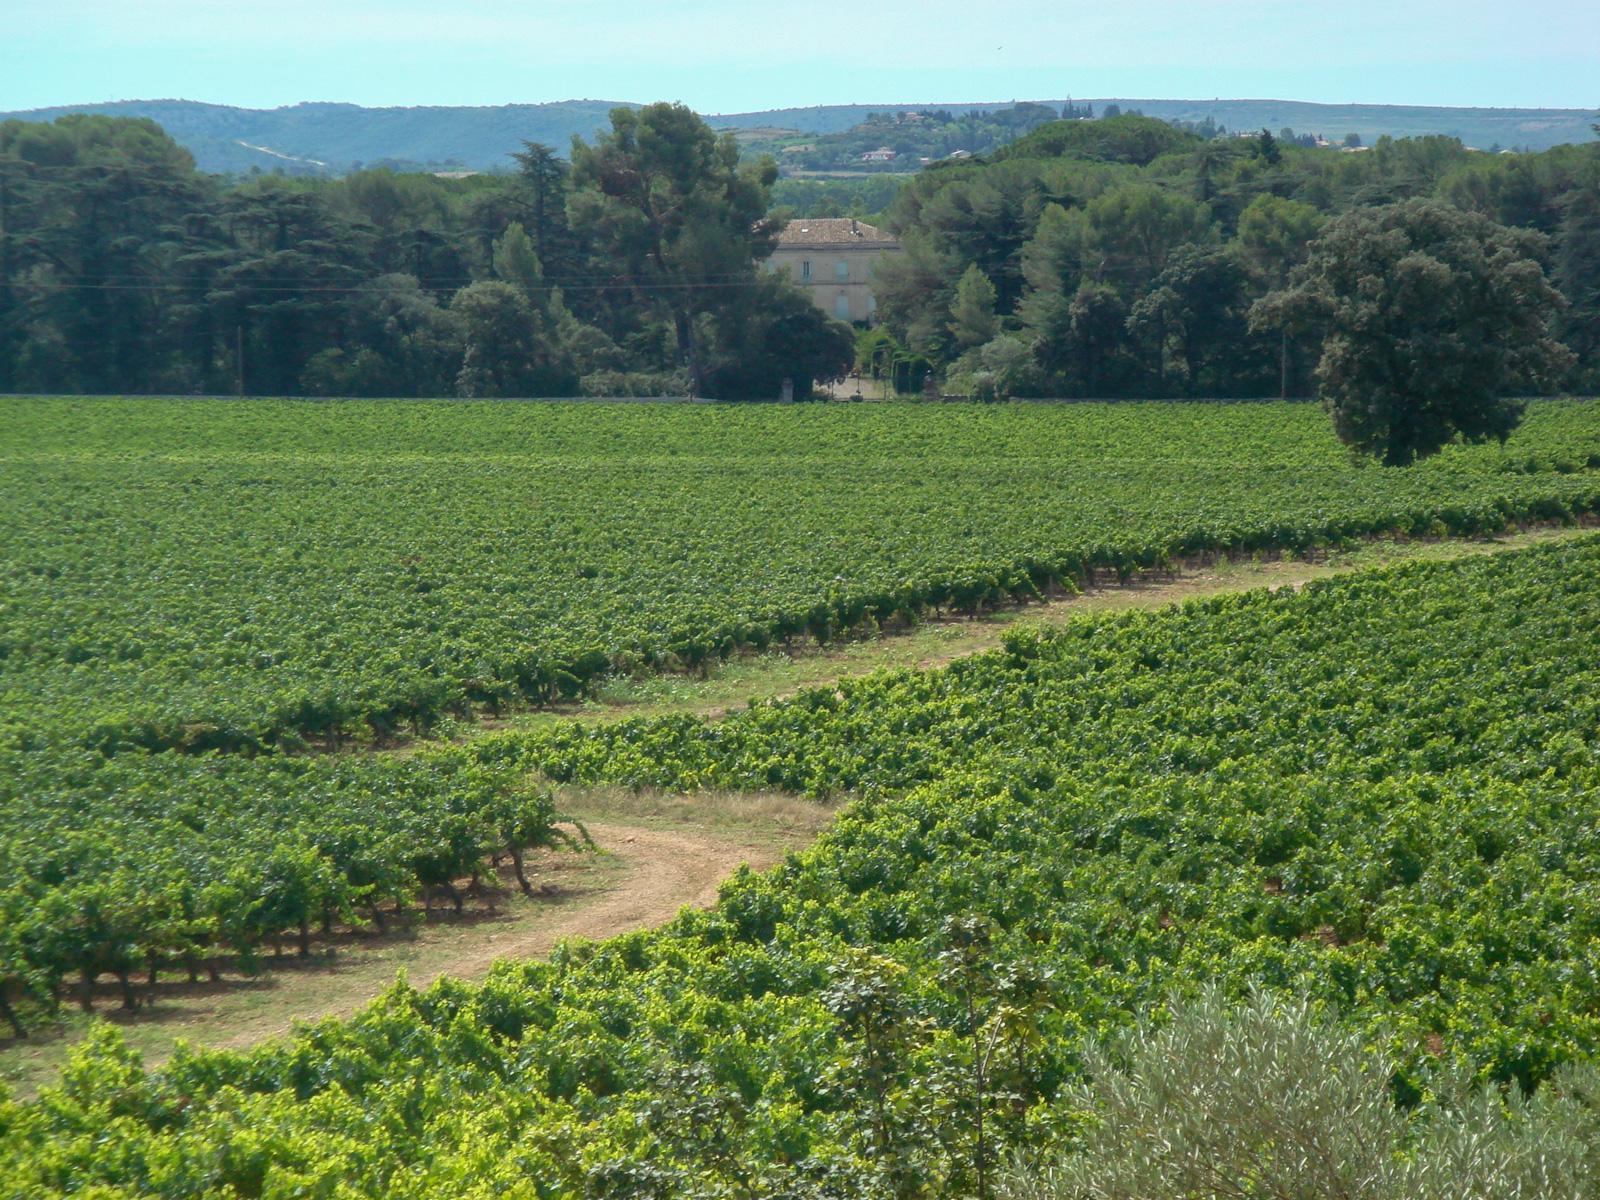 Pierrefont vineyard near Gignac - Hérault